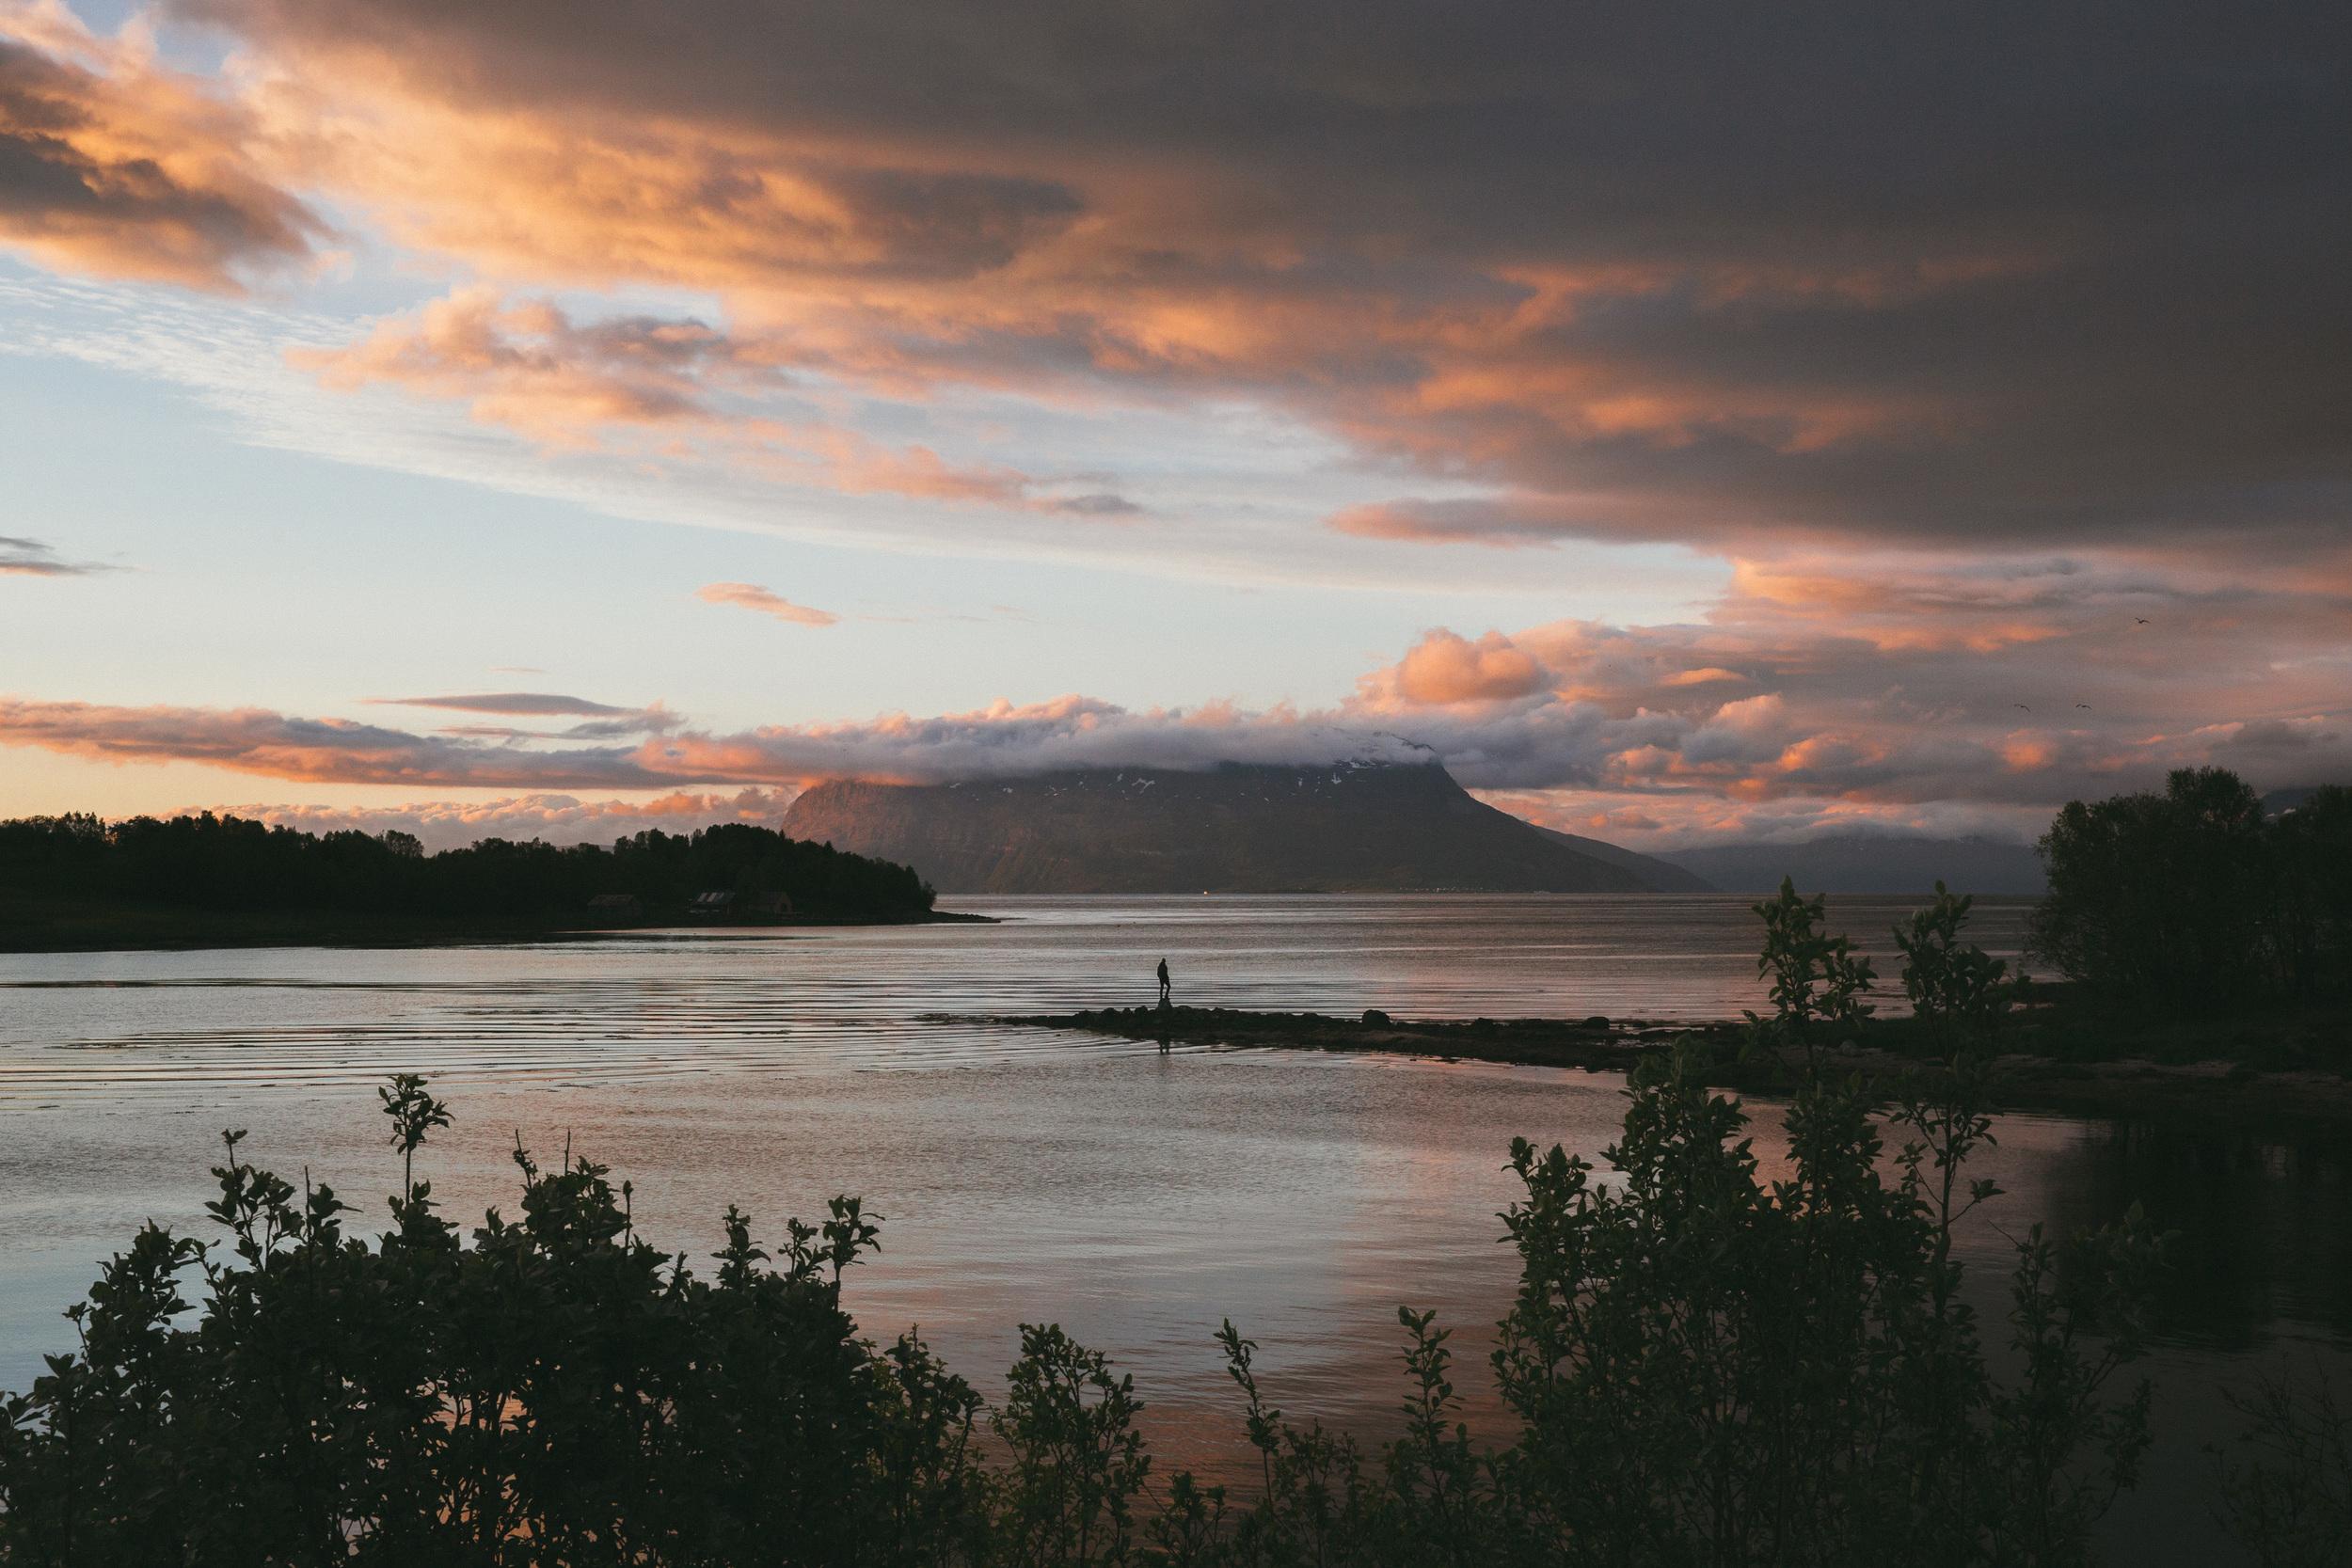 Sunset over at Harstad